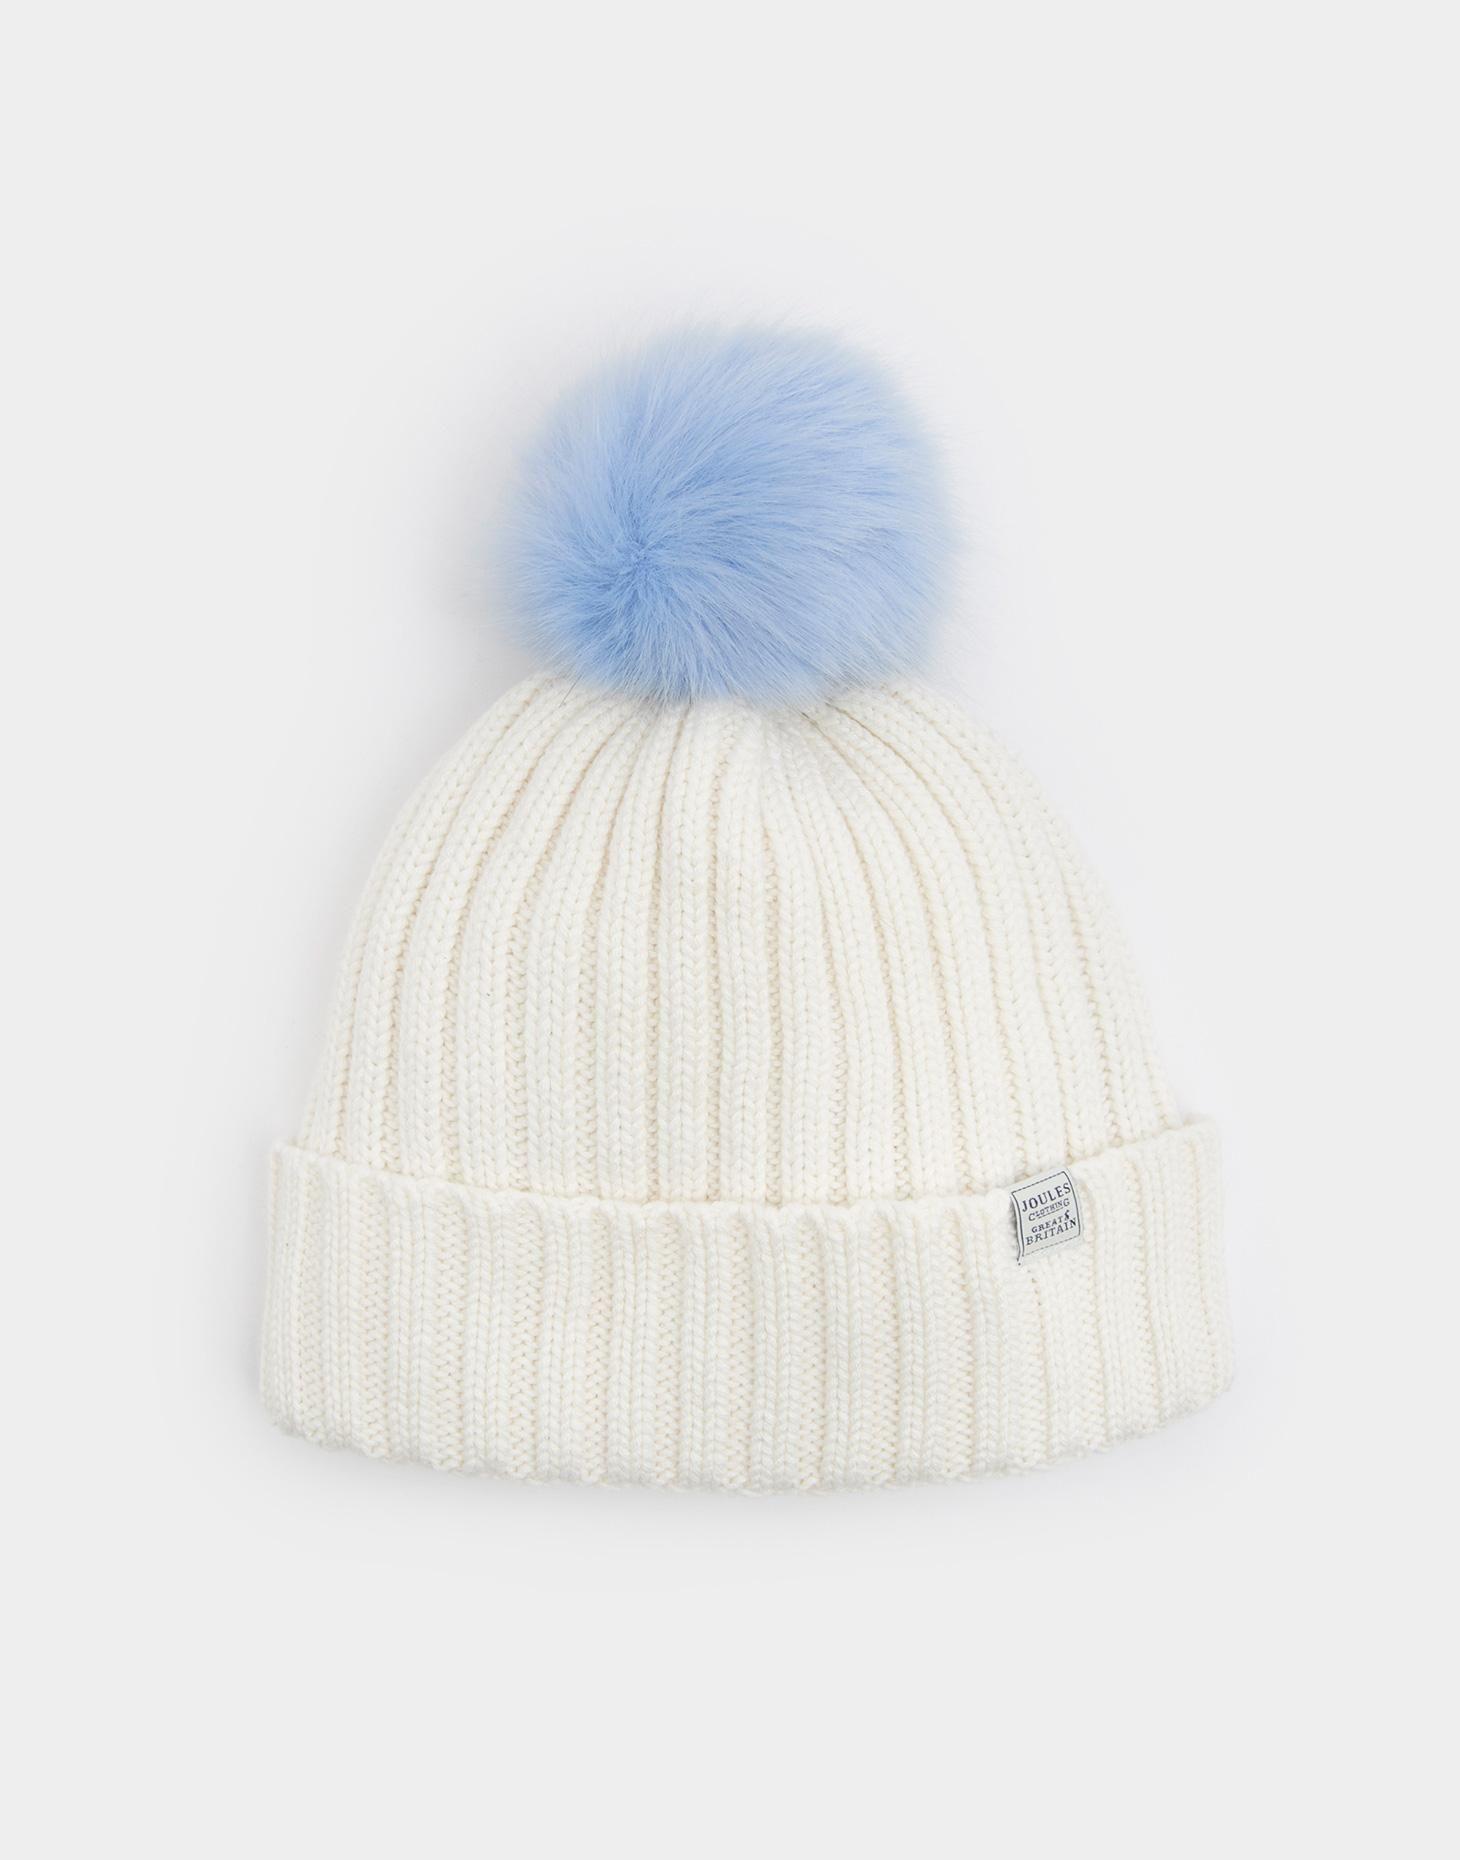 ffbd9c7535b Pop-a-pom Light Blue Bobble Hat